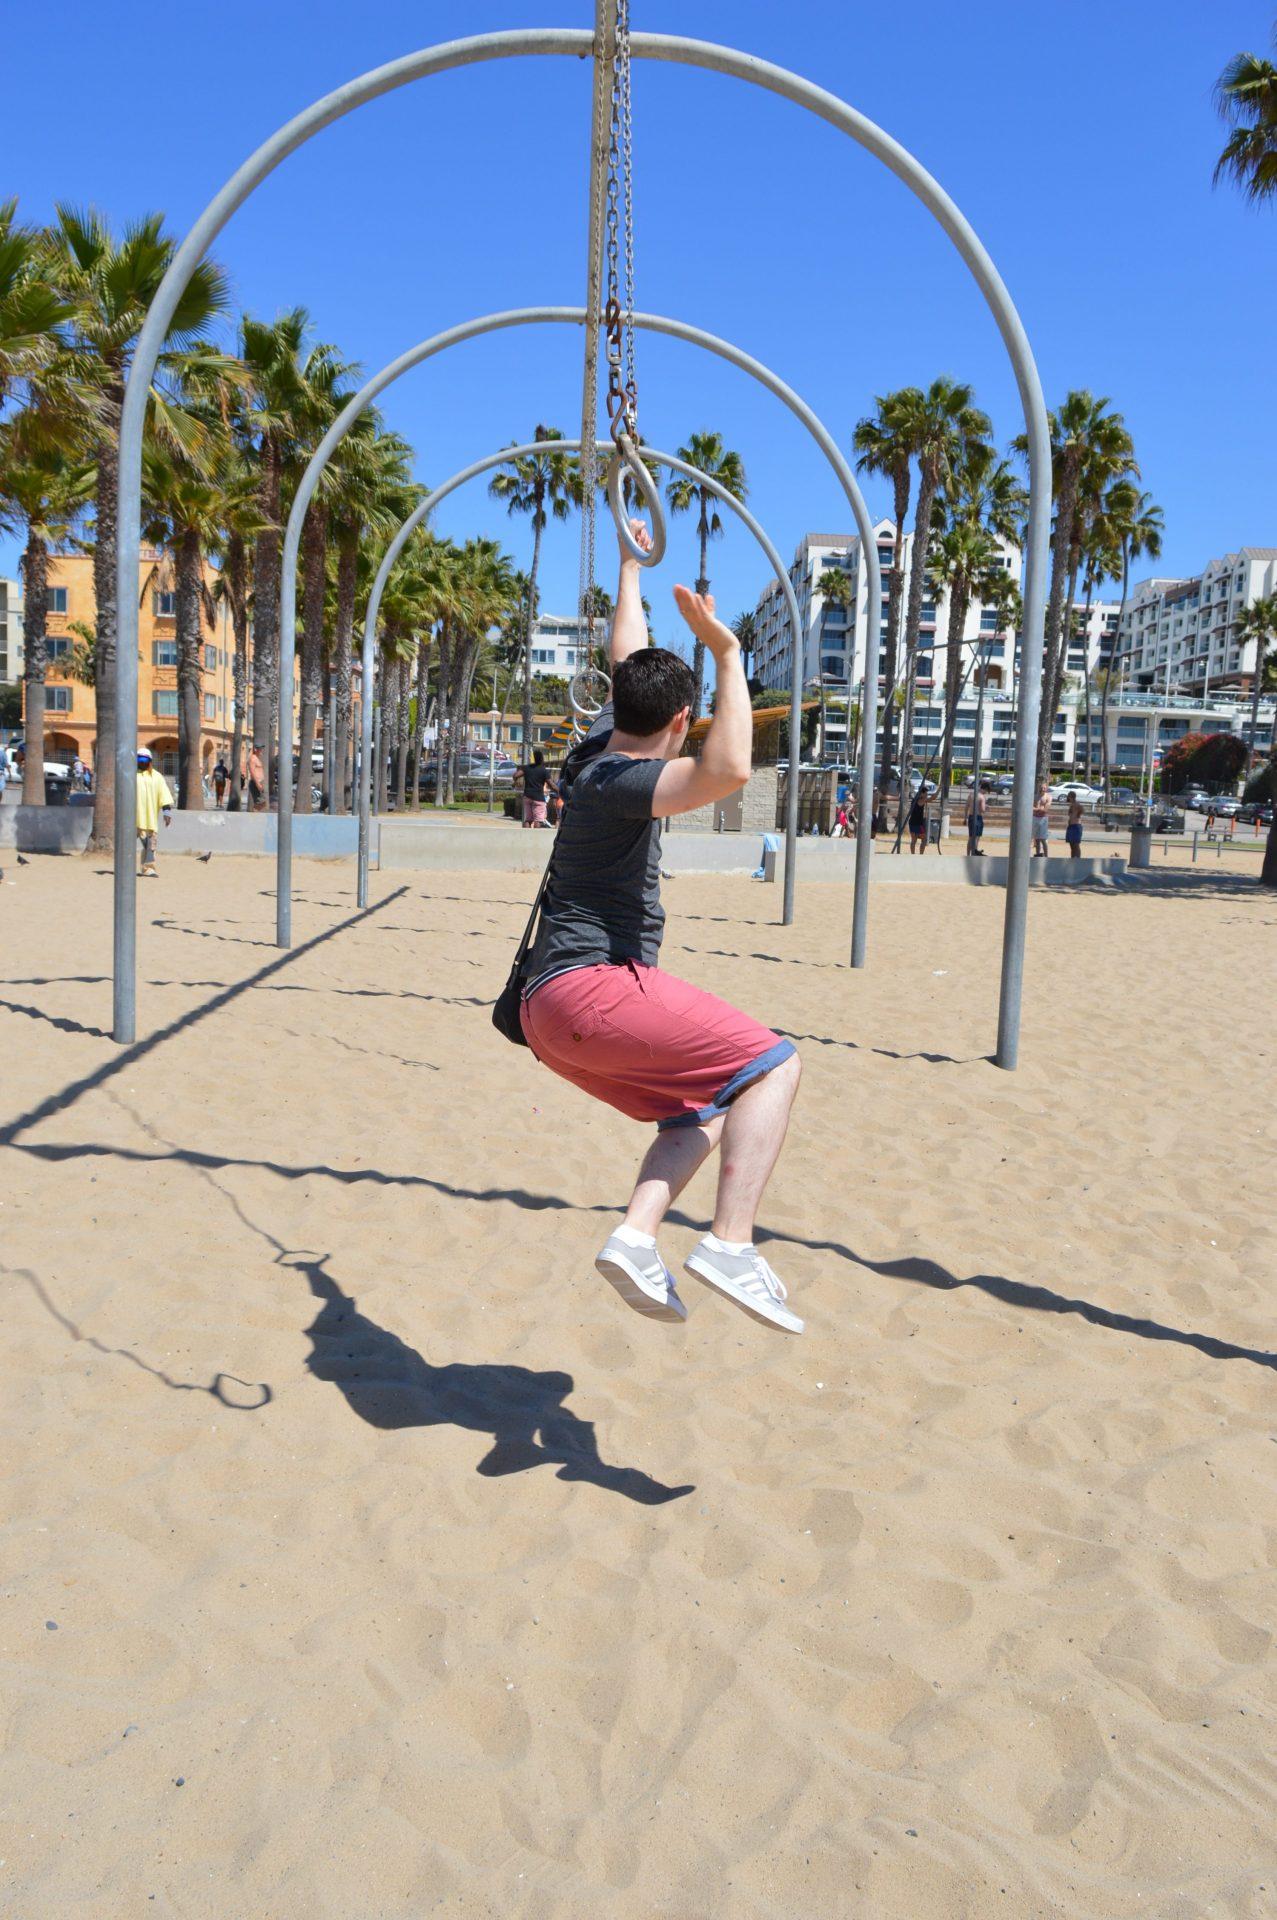 Santa Monica rings